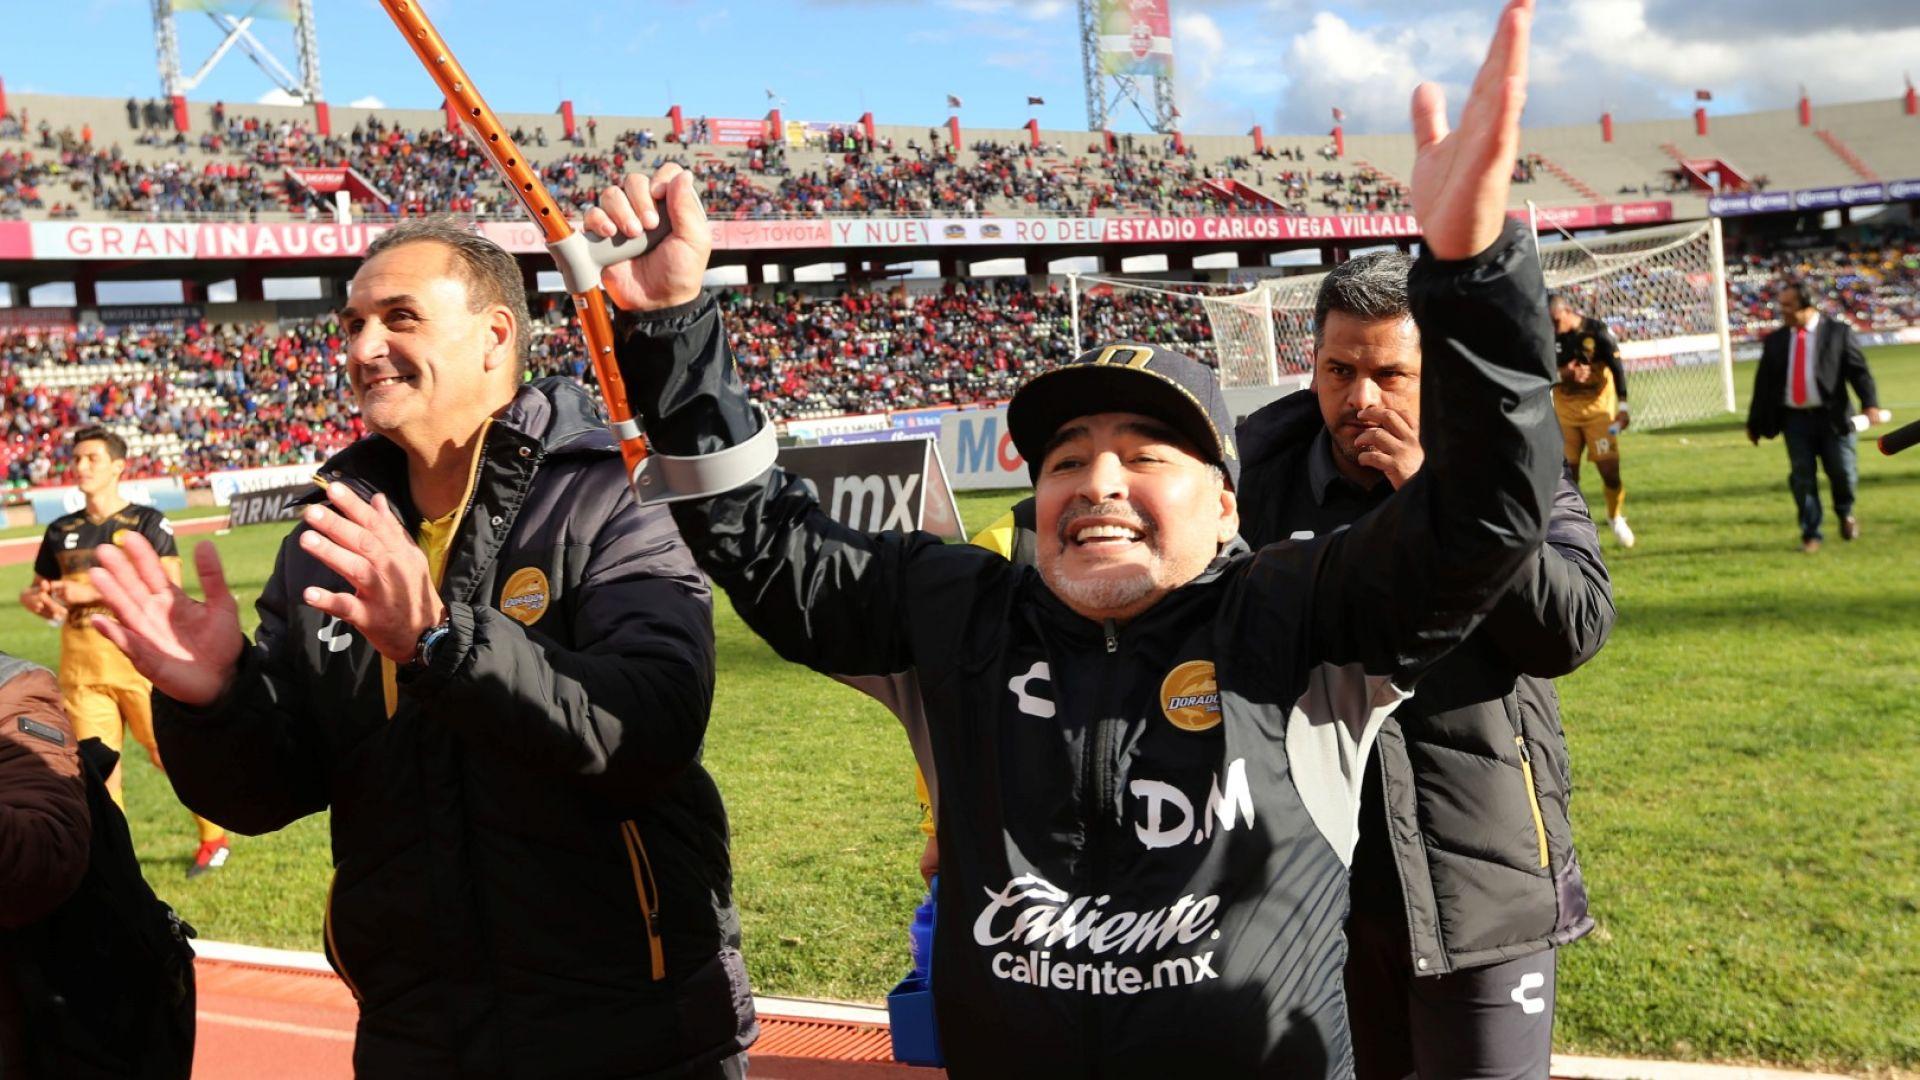 Марадона чака наказание, посвети победа на Мадуро